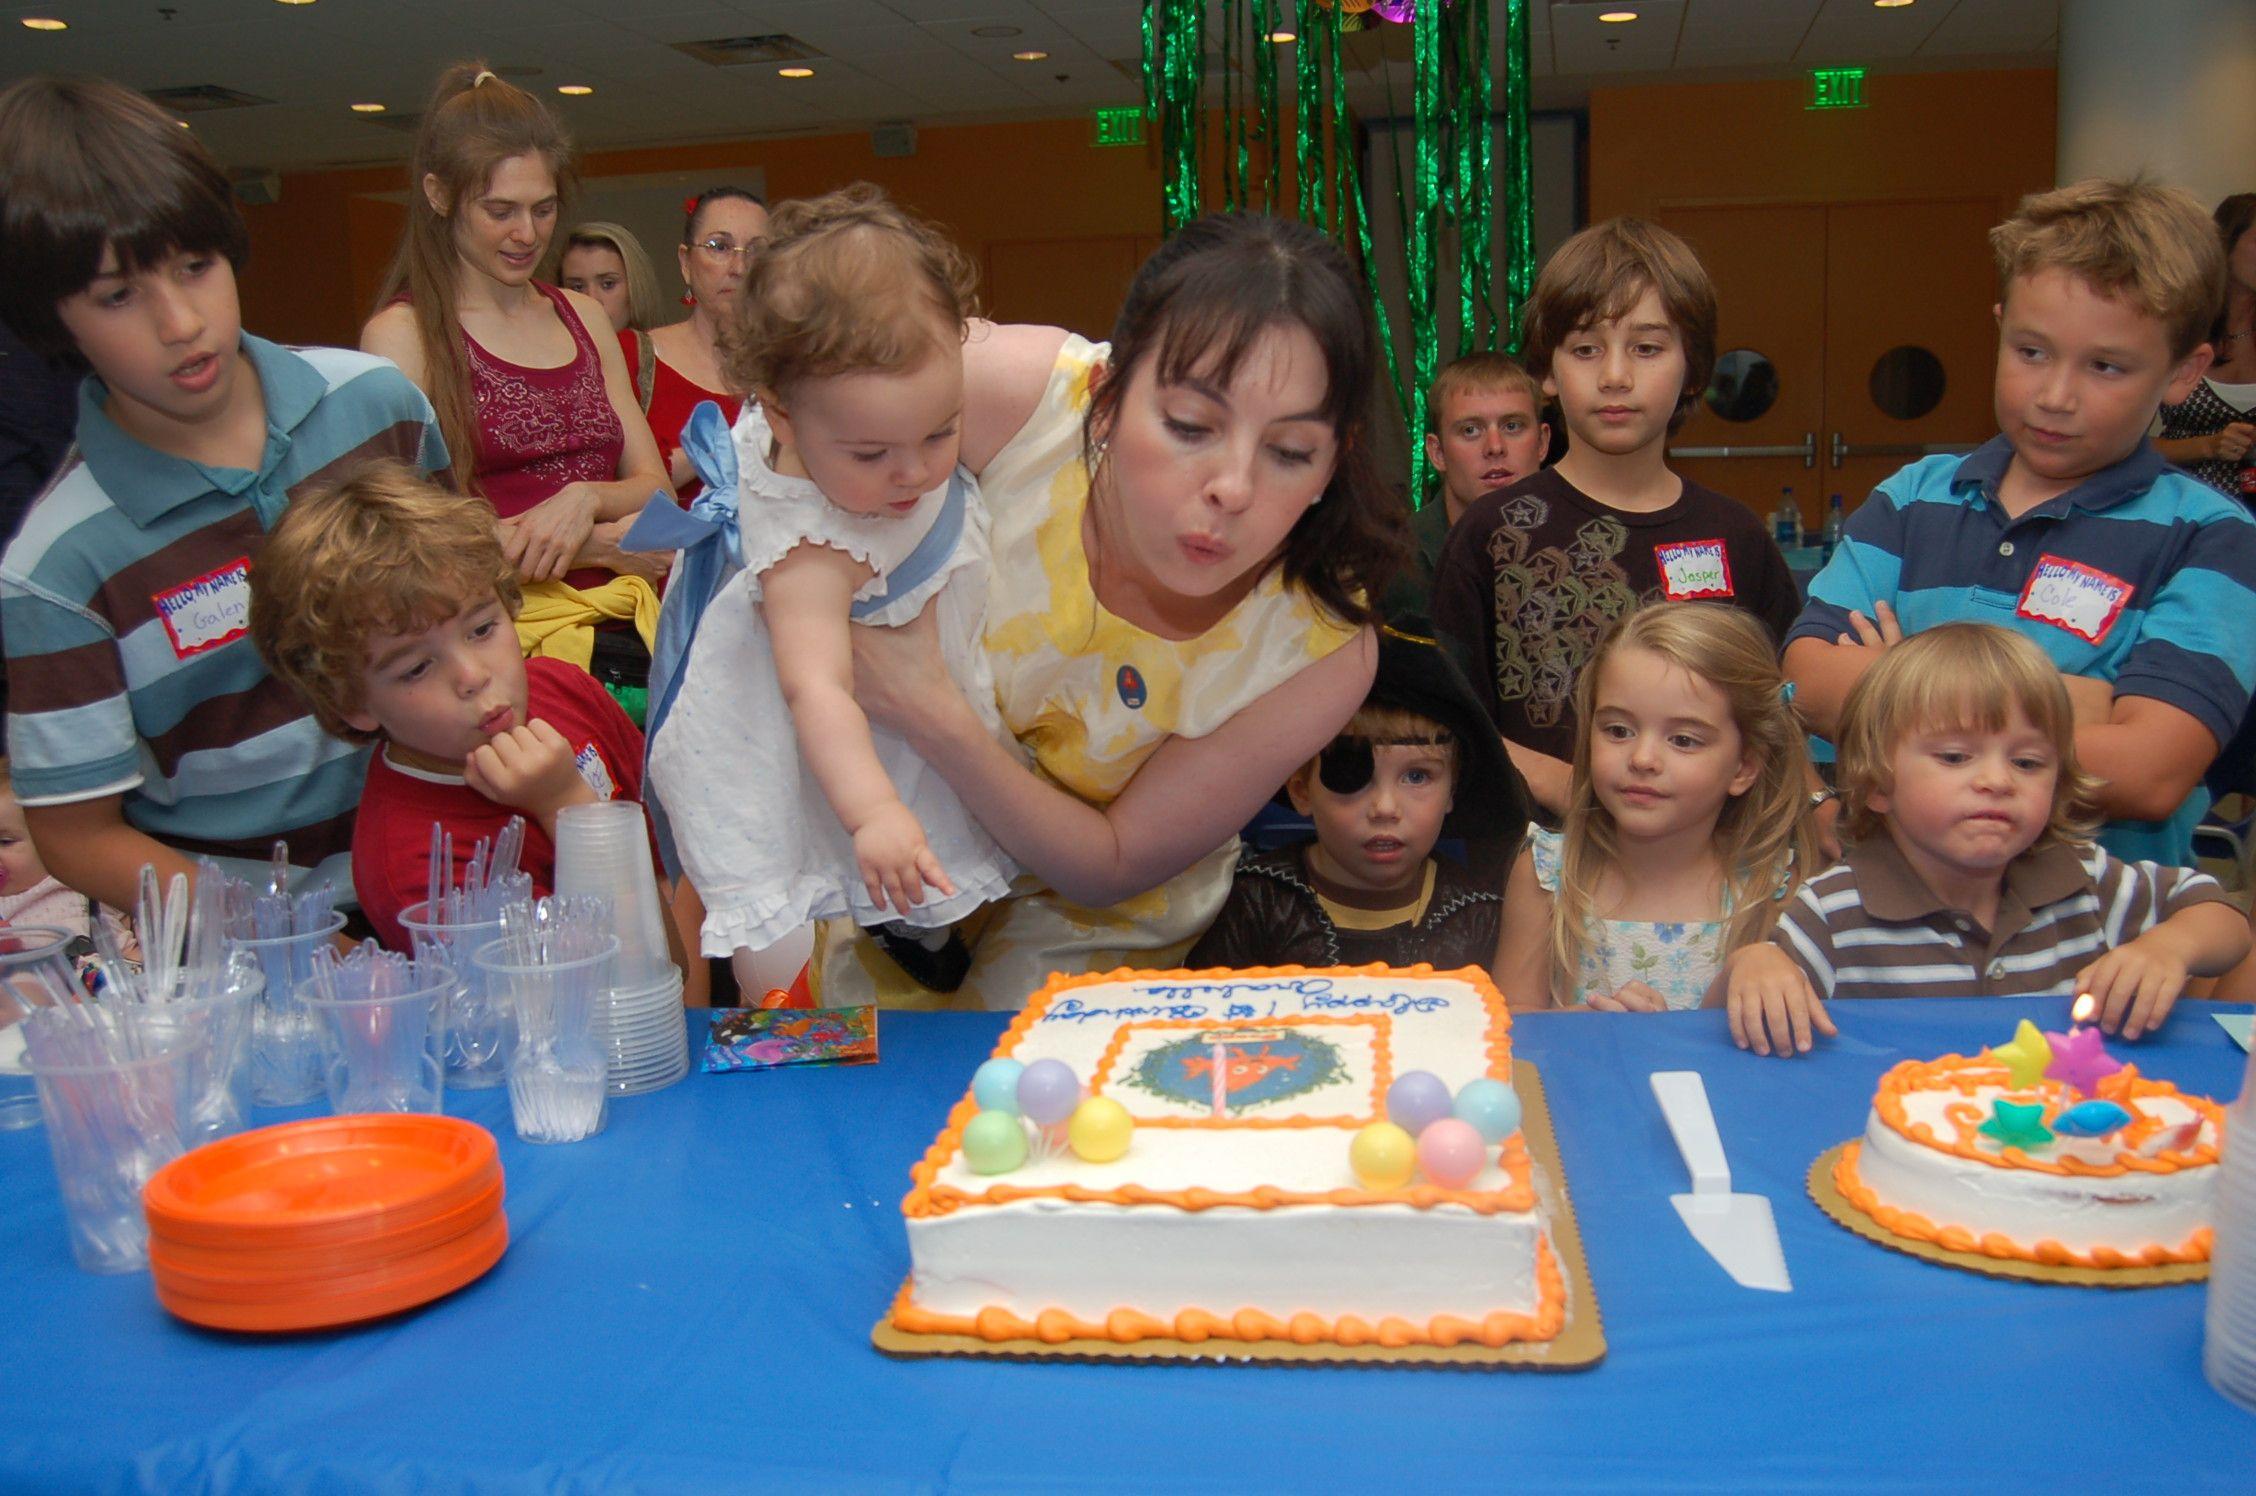 Atlanta birthday parties at Aquarium! Kids party